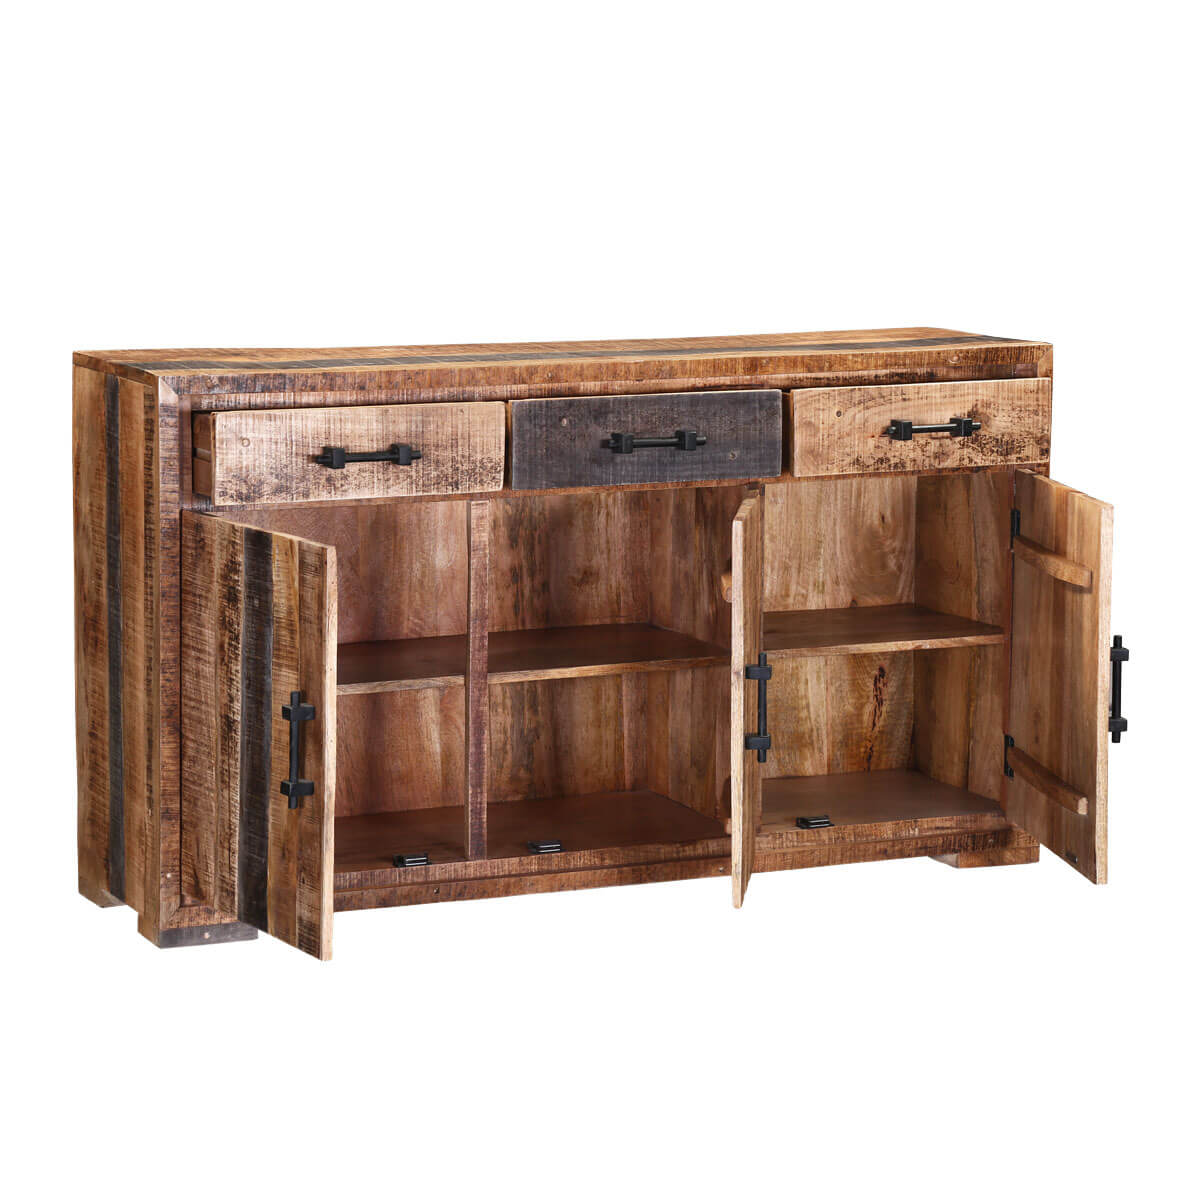 Shenandoah solid wood 3 drawer rustic buffet